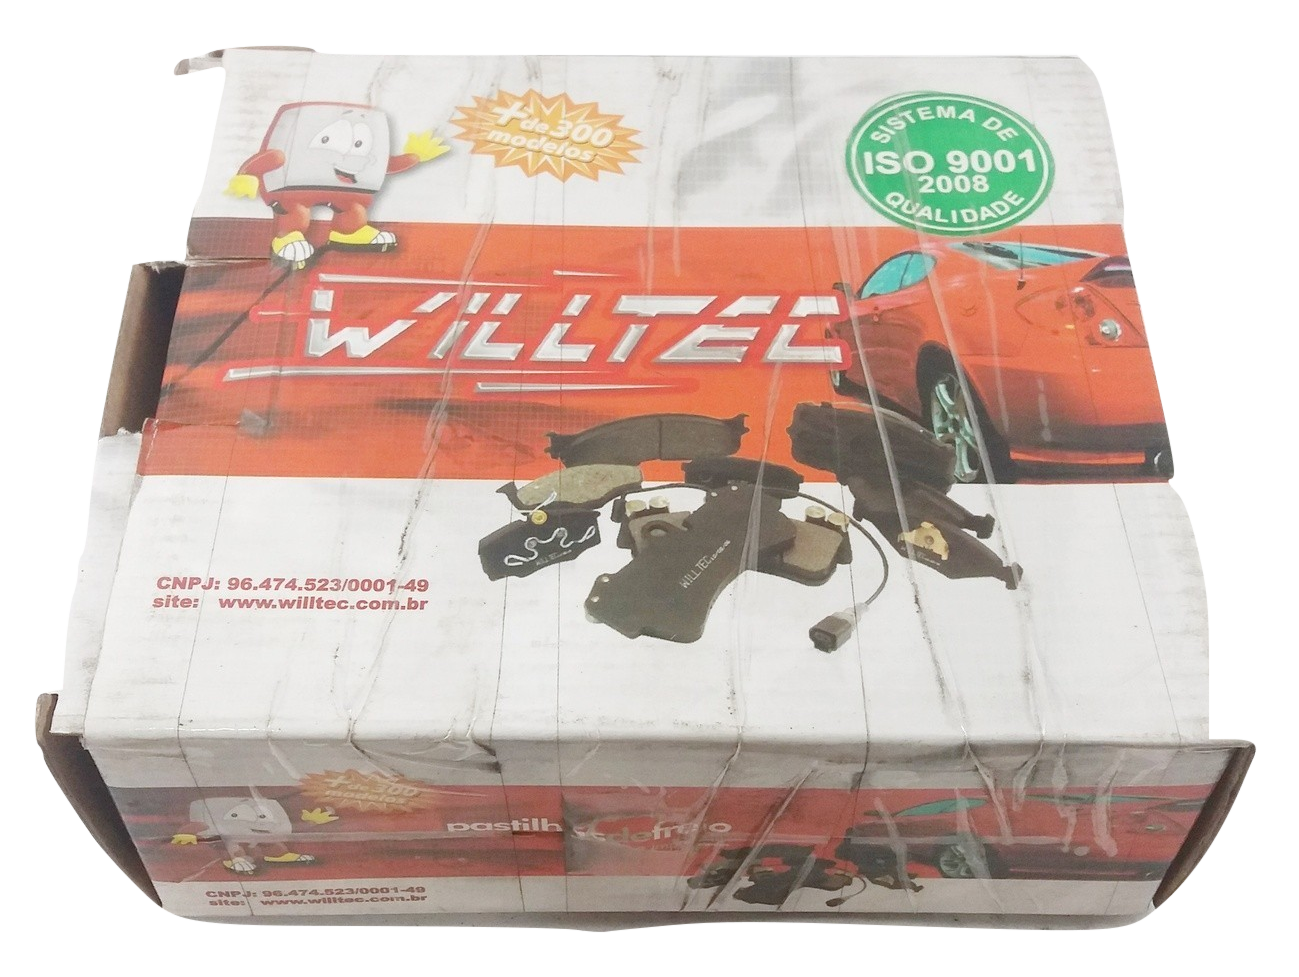 Pastilha de Freio Willtec - BMW 525i / 530i / 540i / 545i / 645i / 745i / M3 / M5 / M6 / X5  - Dianteira - PW775